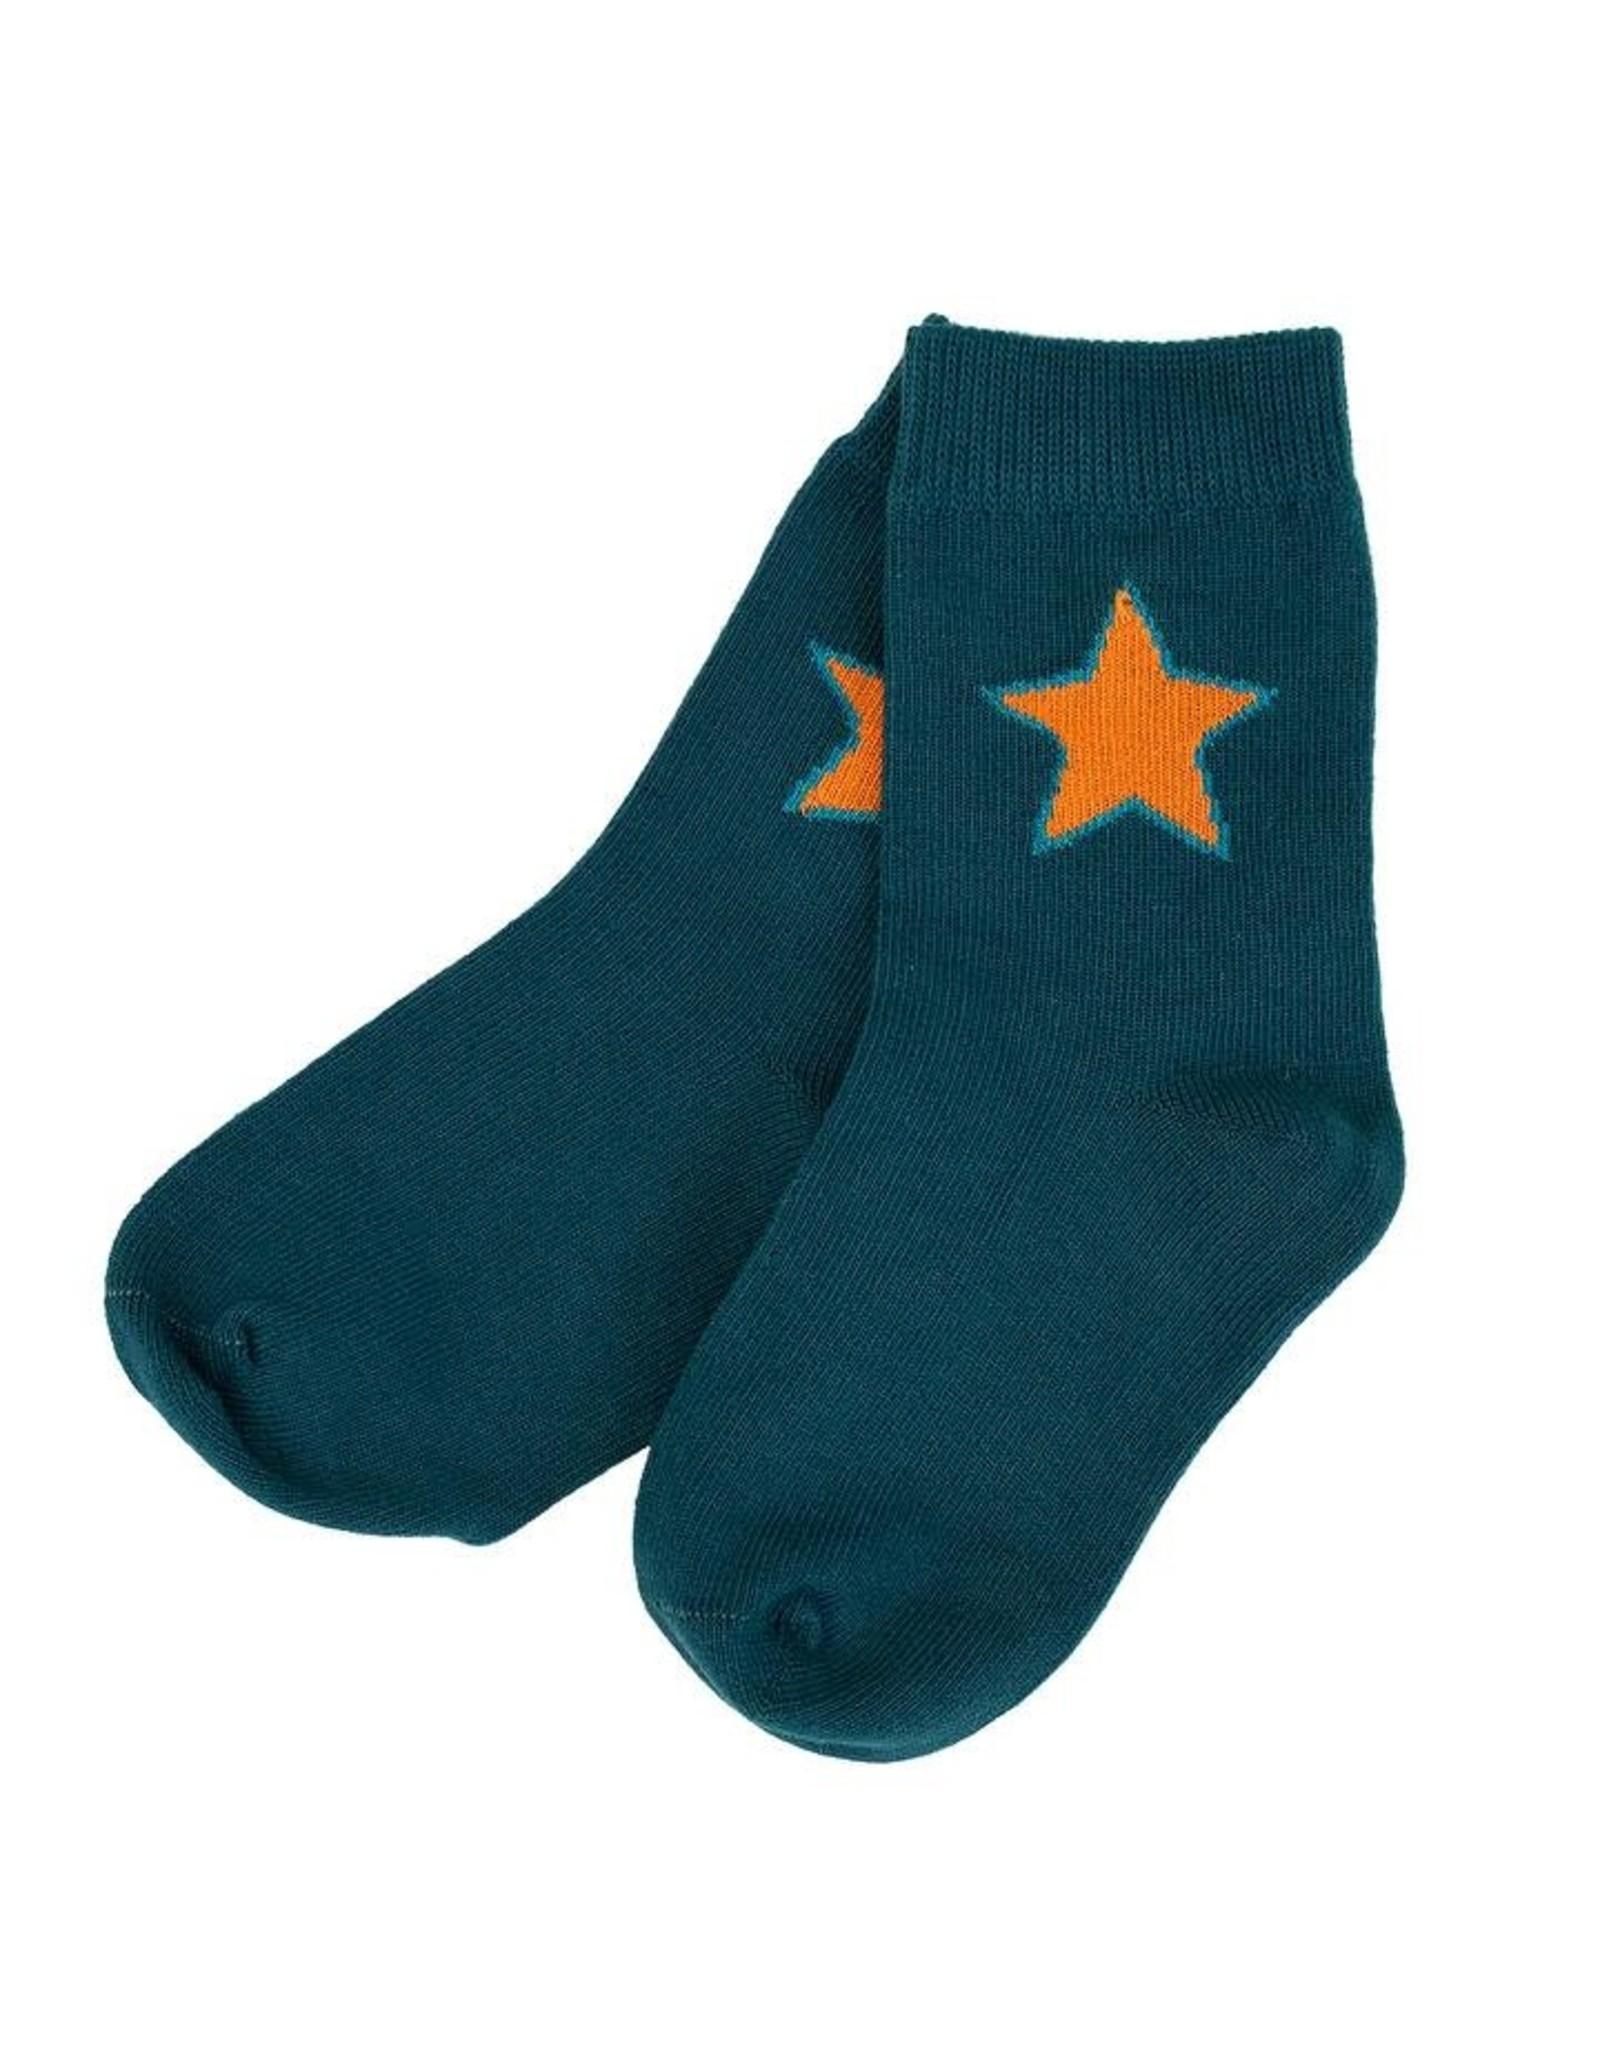 Villervalla Donkerblauwe sokken